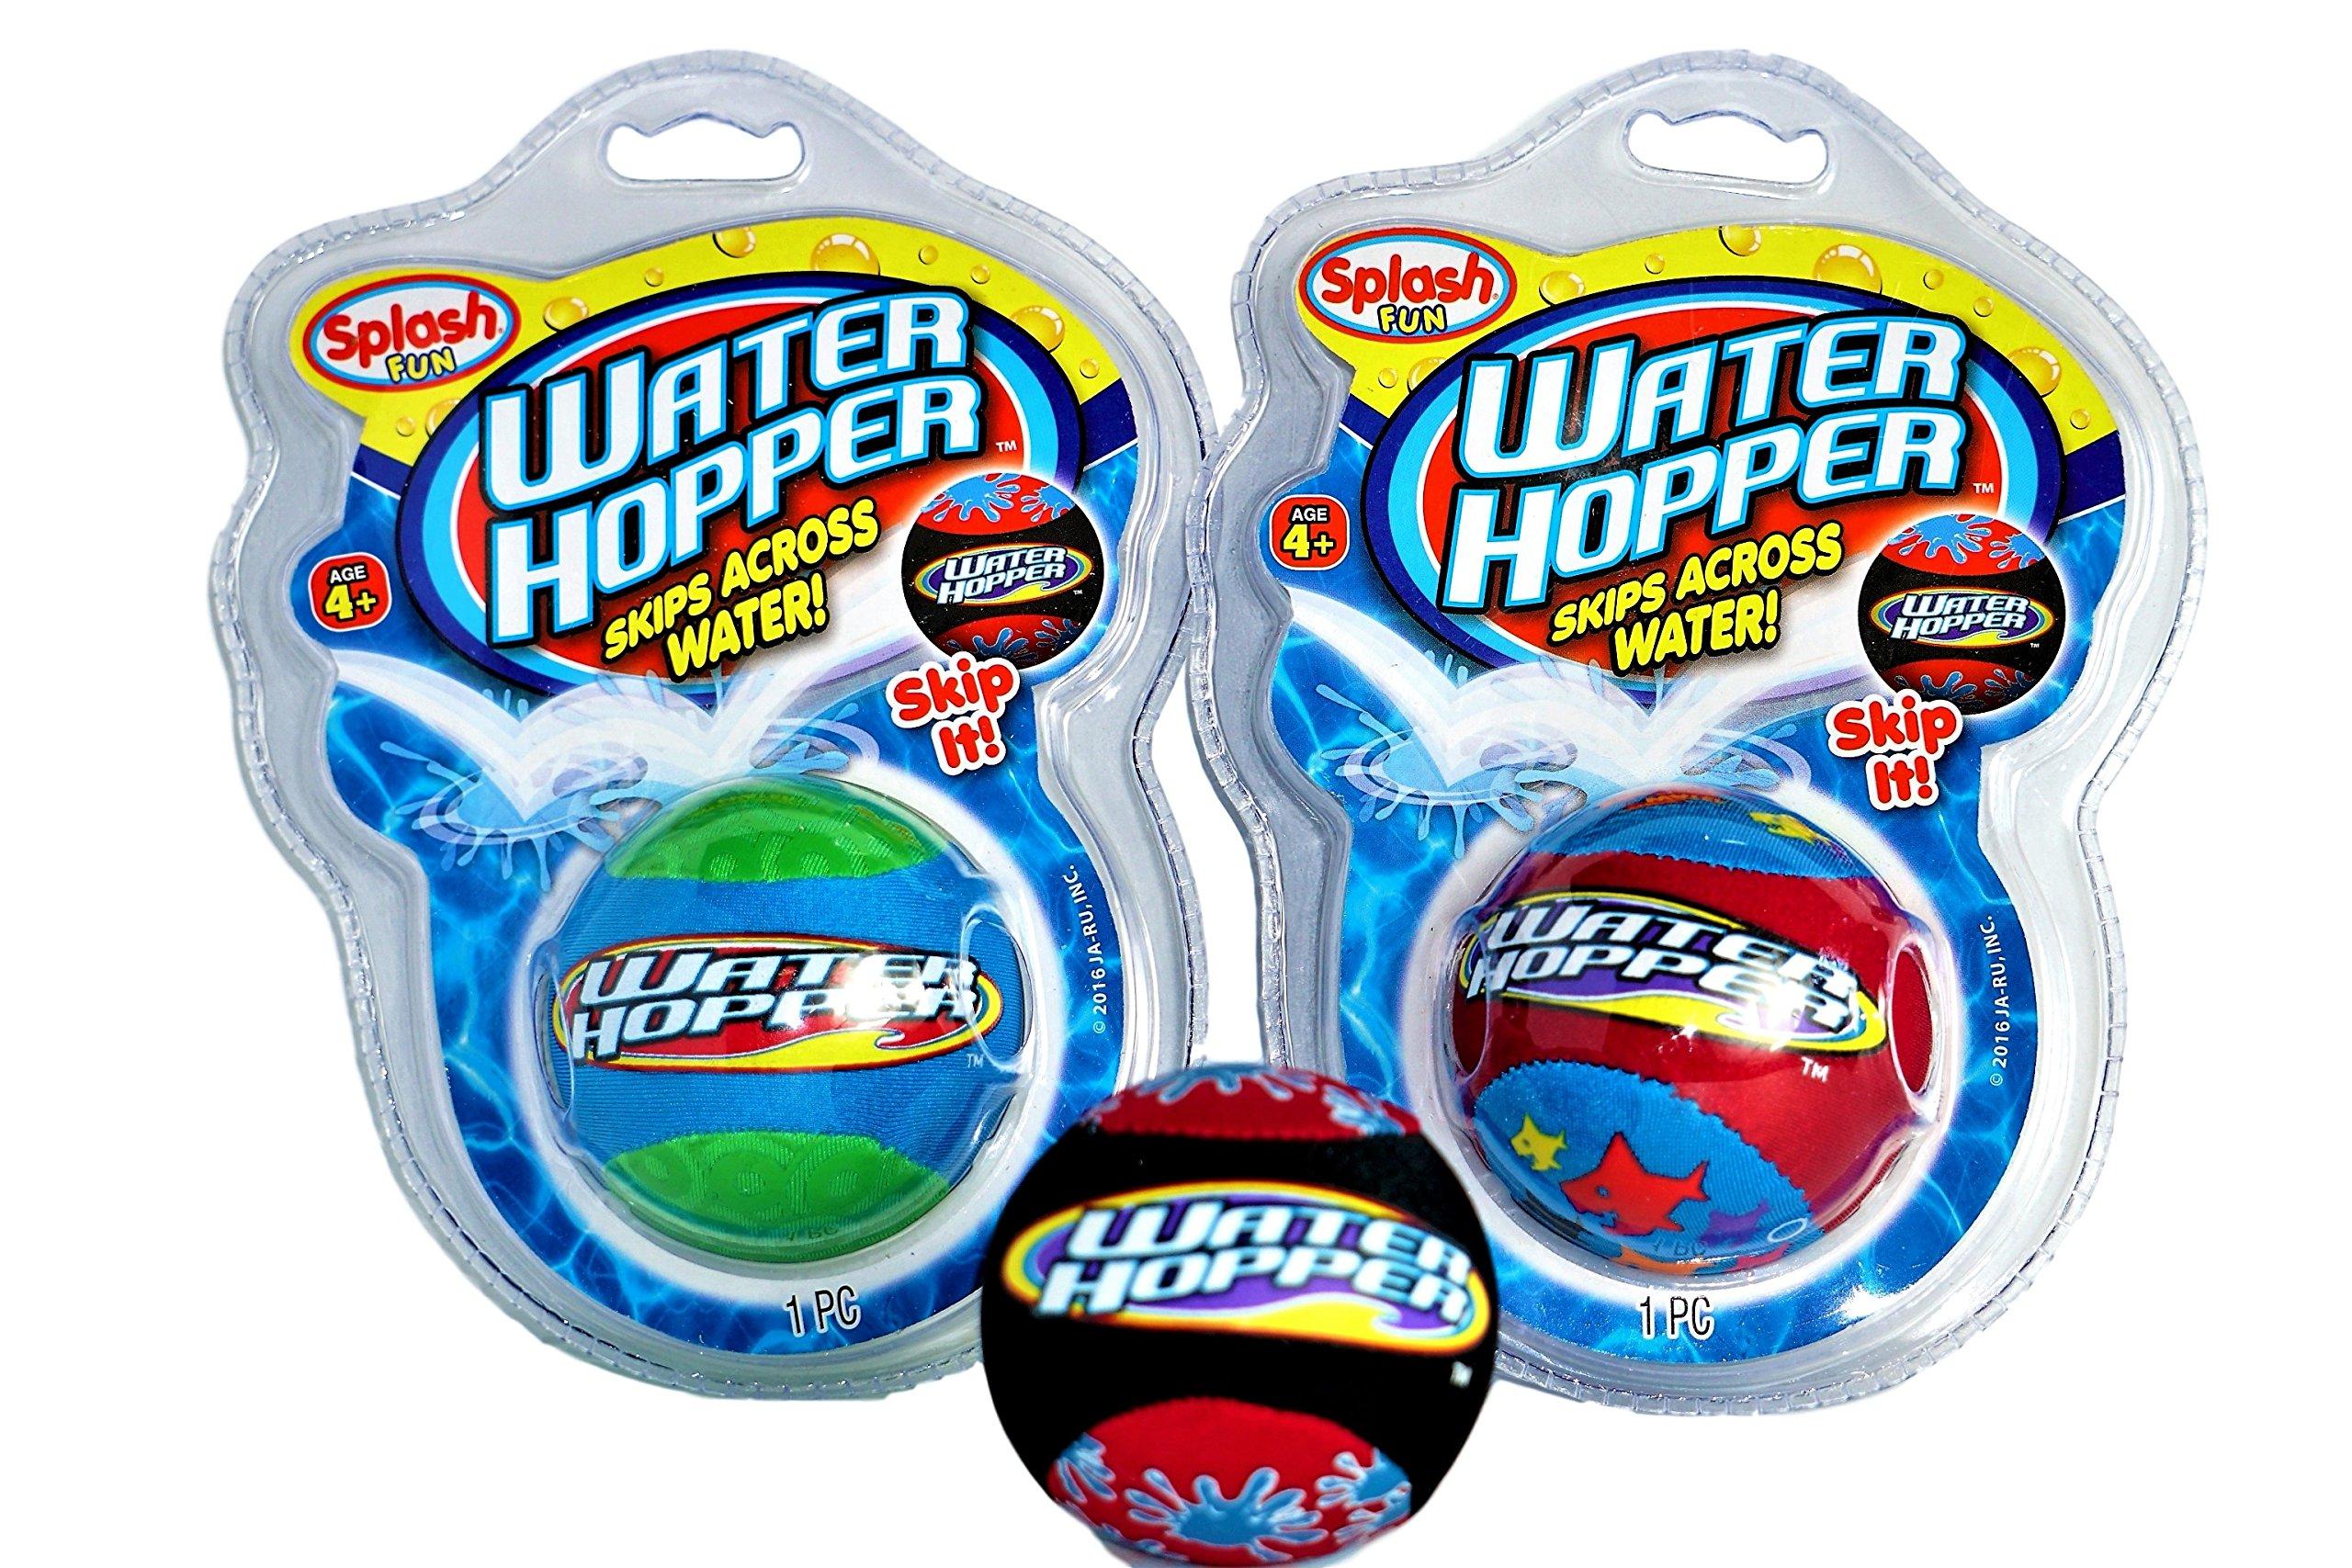 JA-RU Pro Water Hopper Skip it Bouncing Ball (Pack of 72 Units) Bounce & Skips | Item #880-72 by JA-RU (Image #5)